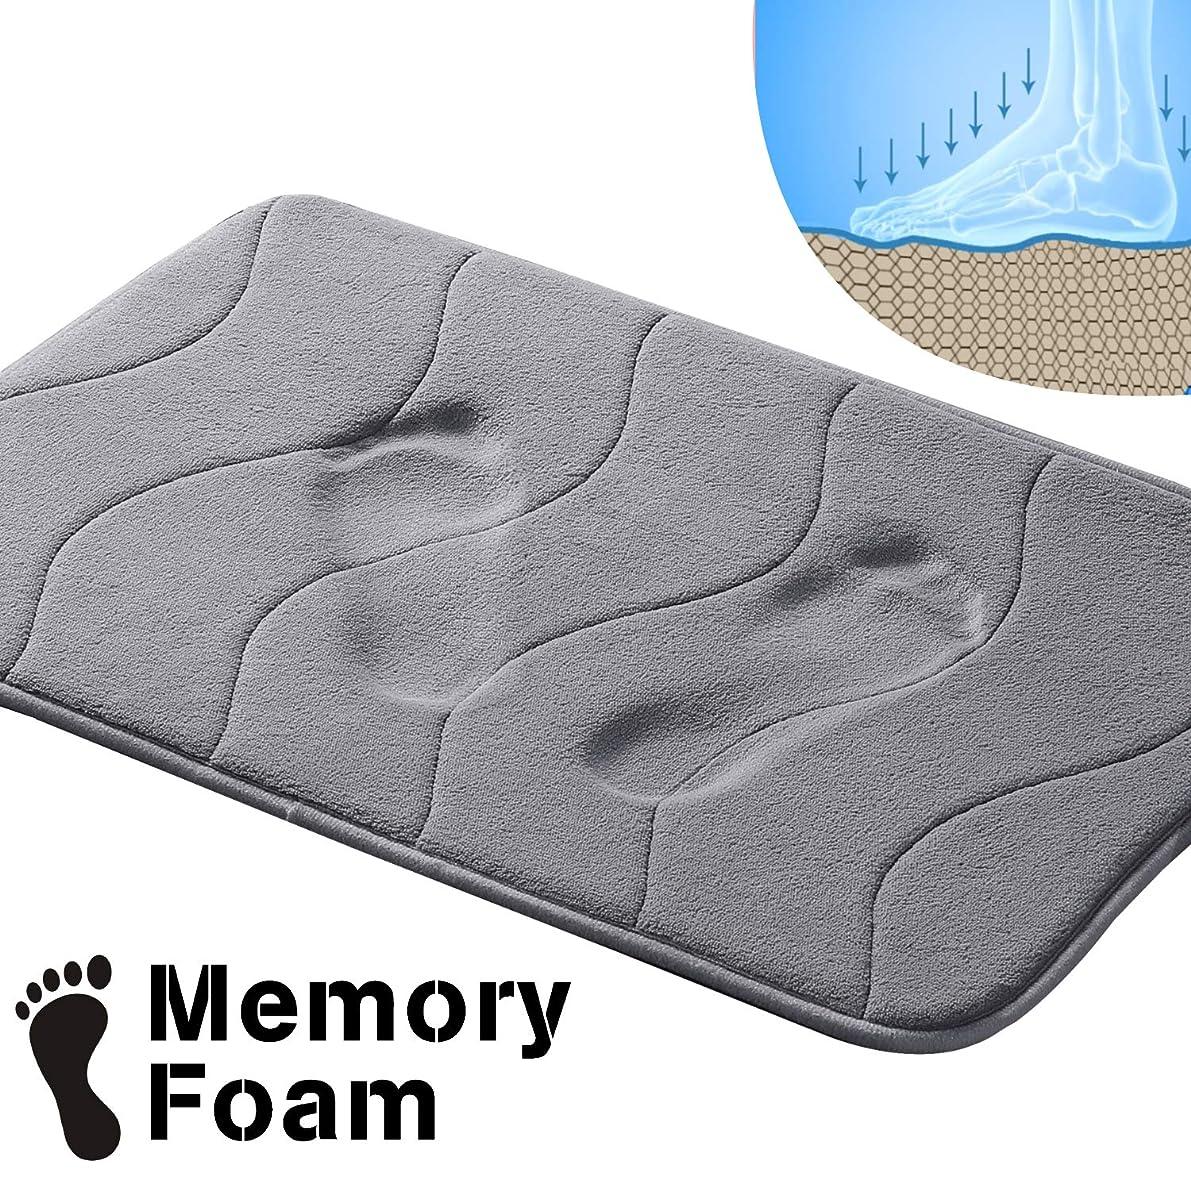 Memory Foam Coral Fleece Non Slip Bathroom Mat, Super Soft Microfiber Bath Mat Set Machine Washable Bath Rugs Set Super Absorbent Thick and Durable Bath Rugs 17W X 24L Inches (Gray Waved Pattern)